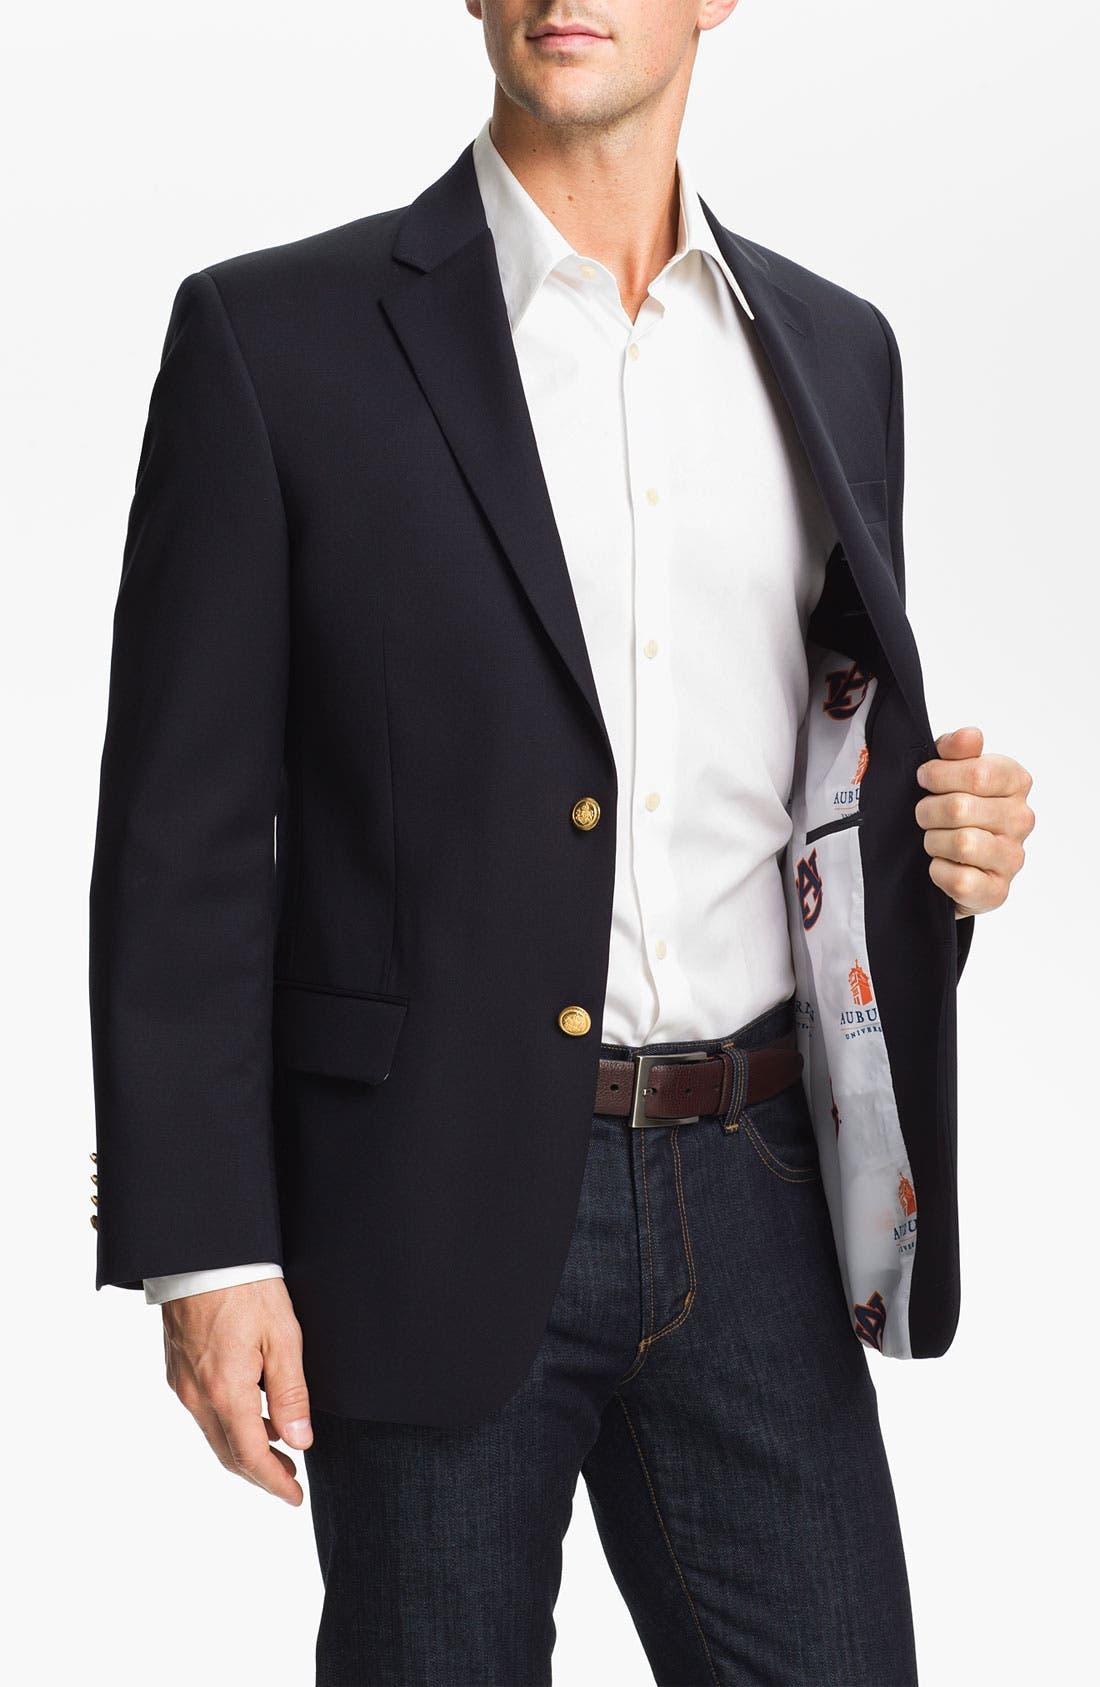 Main Image - S. Cohen 'Auburn University' Blazer (Online Only)